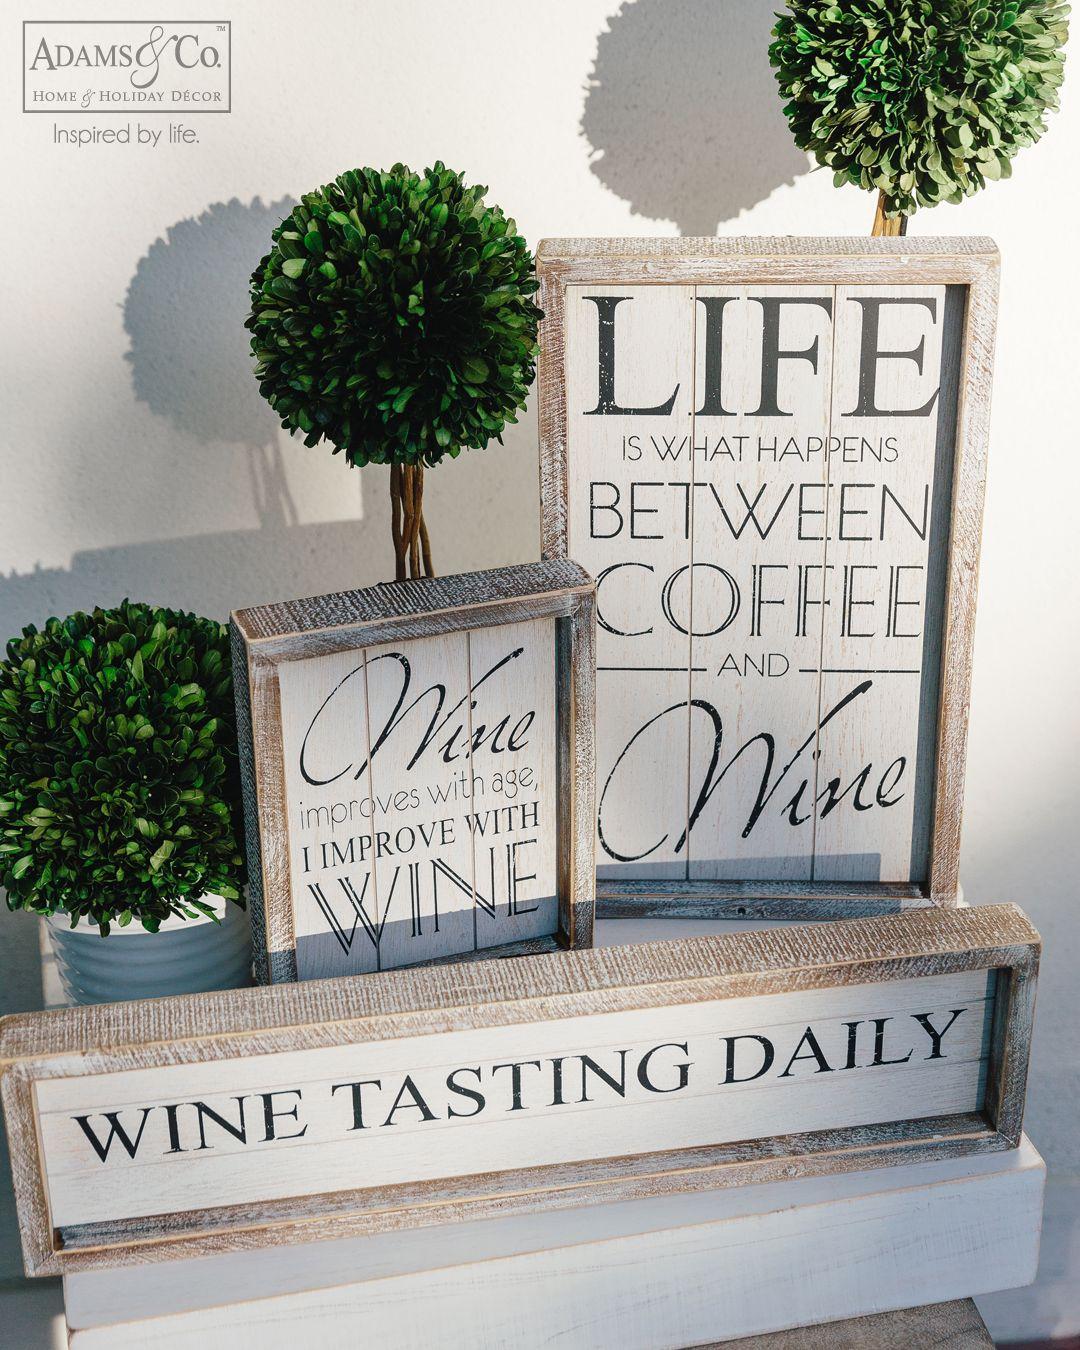 Wine Collection Adams Co Adamsandco Inspiredbylife Wholesale Decor Home Decor Wine Collection